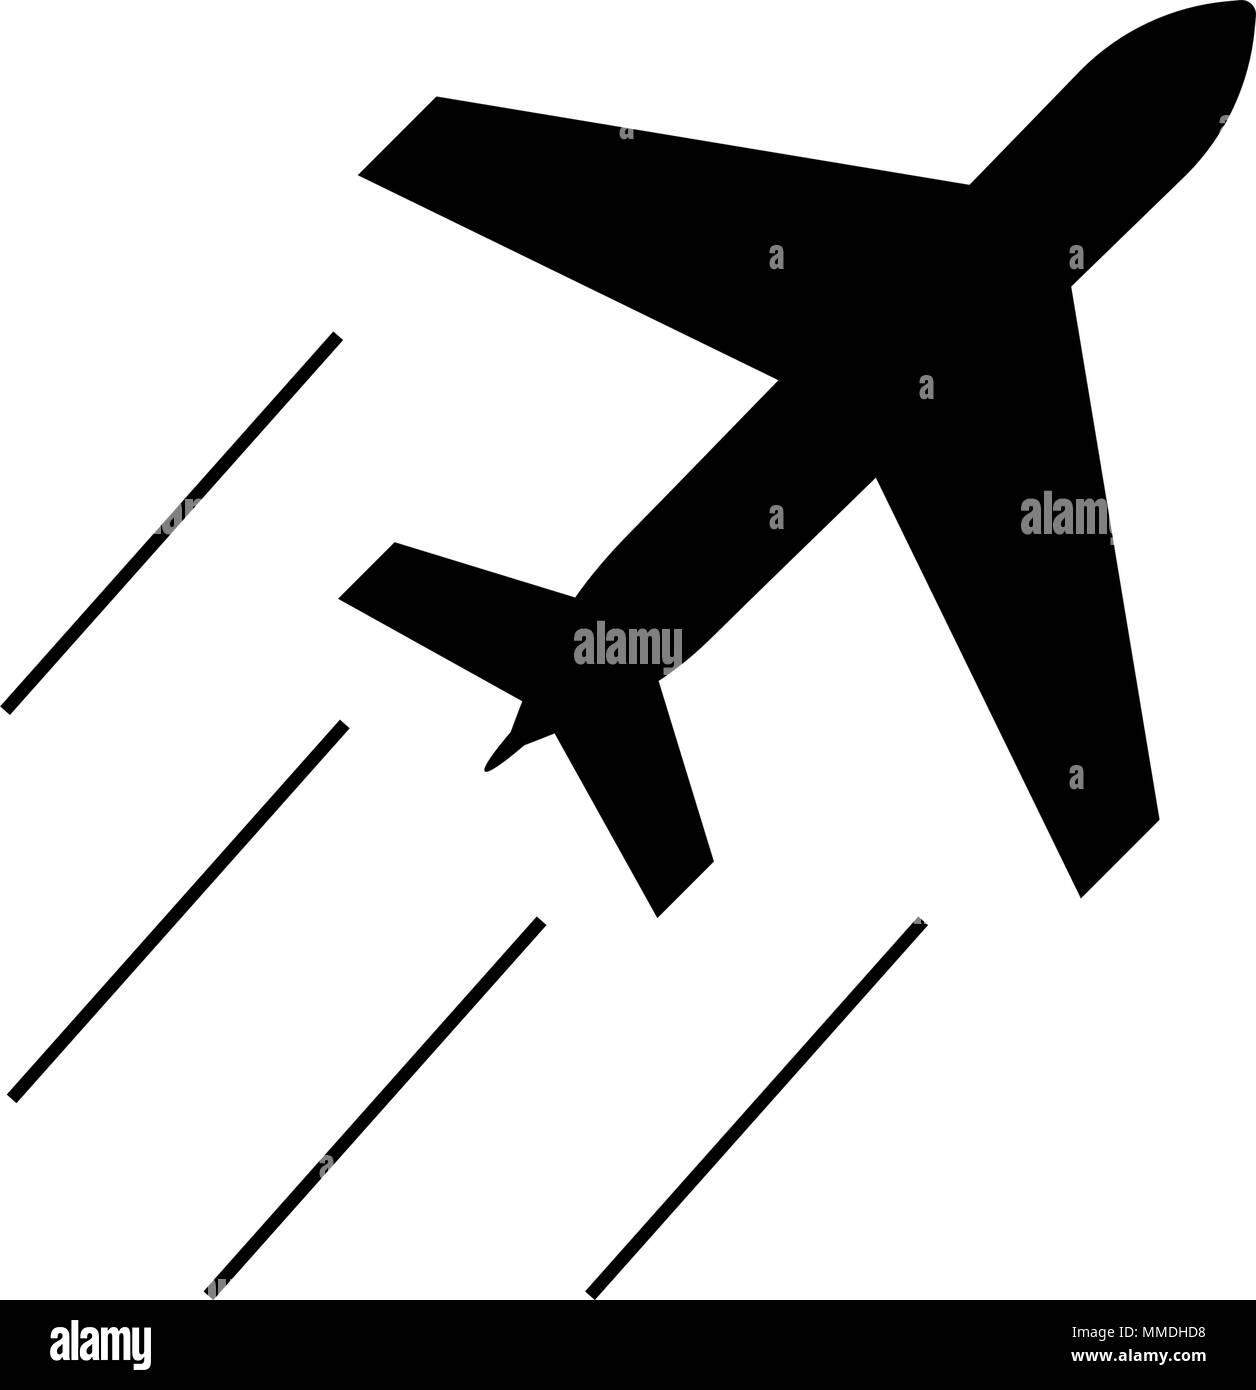 Simple Airplane Icon Aeroplane Silhouette Sign Illustration Stock